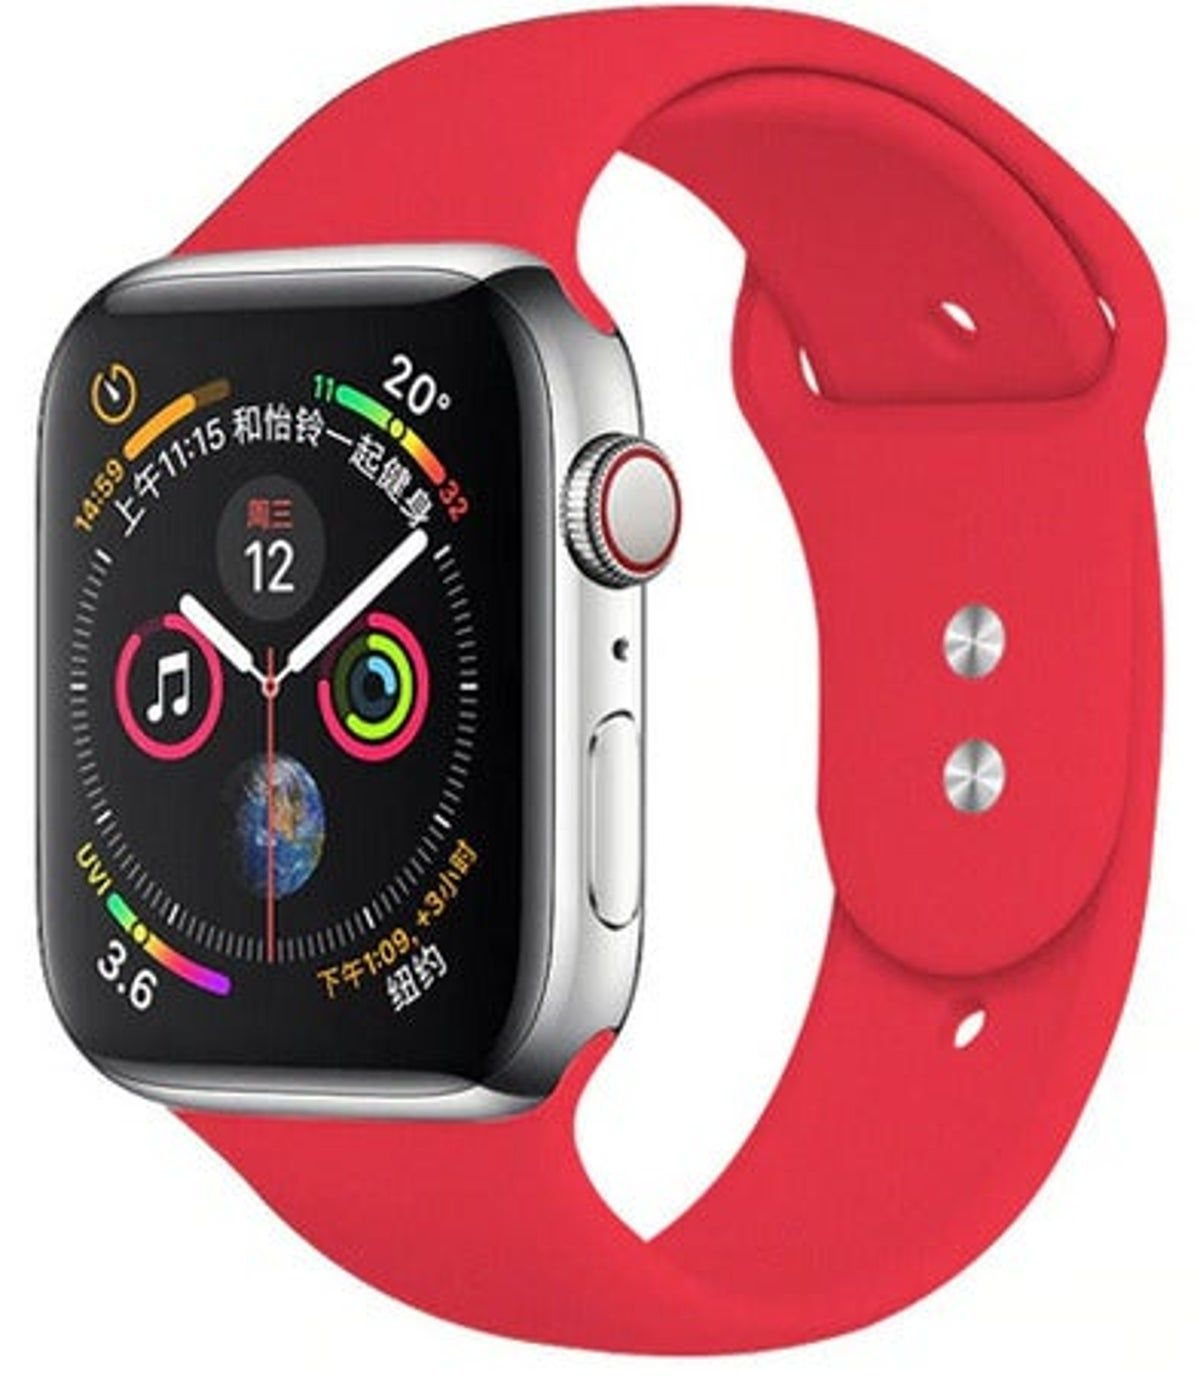 Pin By Gdhaaktavuk On Teknoloji Apple Watch Black Wallpaper Iphone Dark Apple